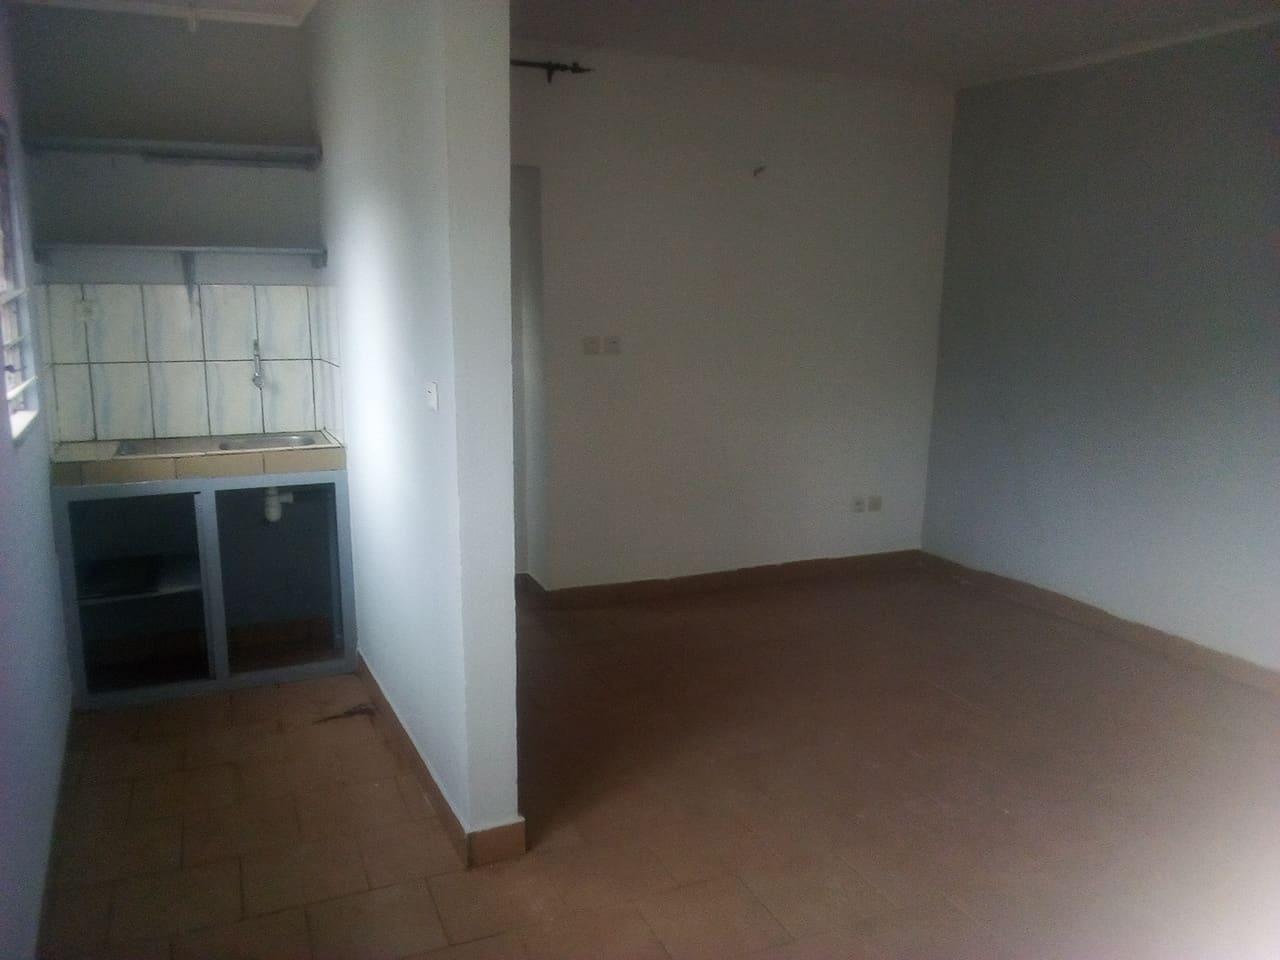 Apartment to rent - Yaoundé, Mbankolo, pas loin du carrefour golf - 1 living room(s), 2 bedroom(s), 1 bathroom(s) - 120 000 FCFA / month